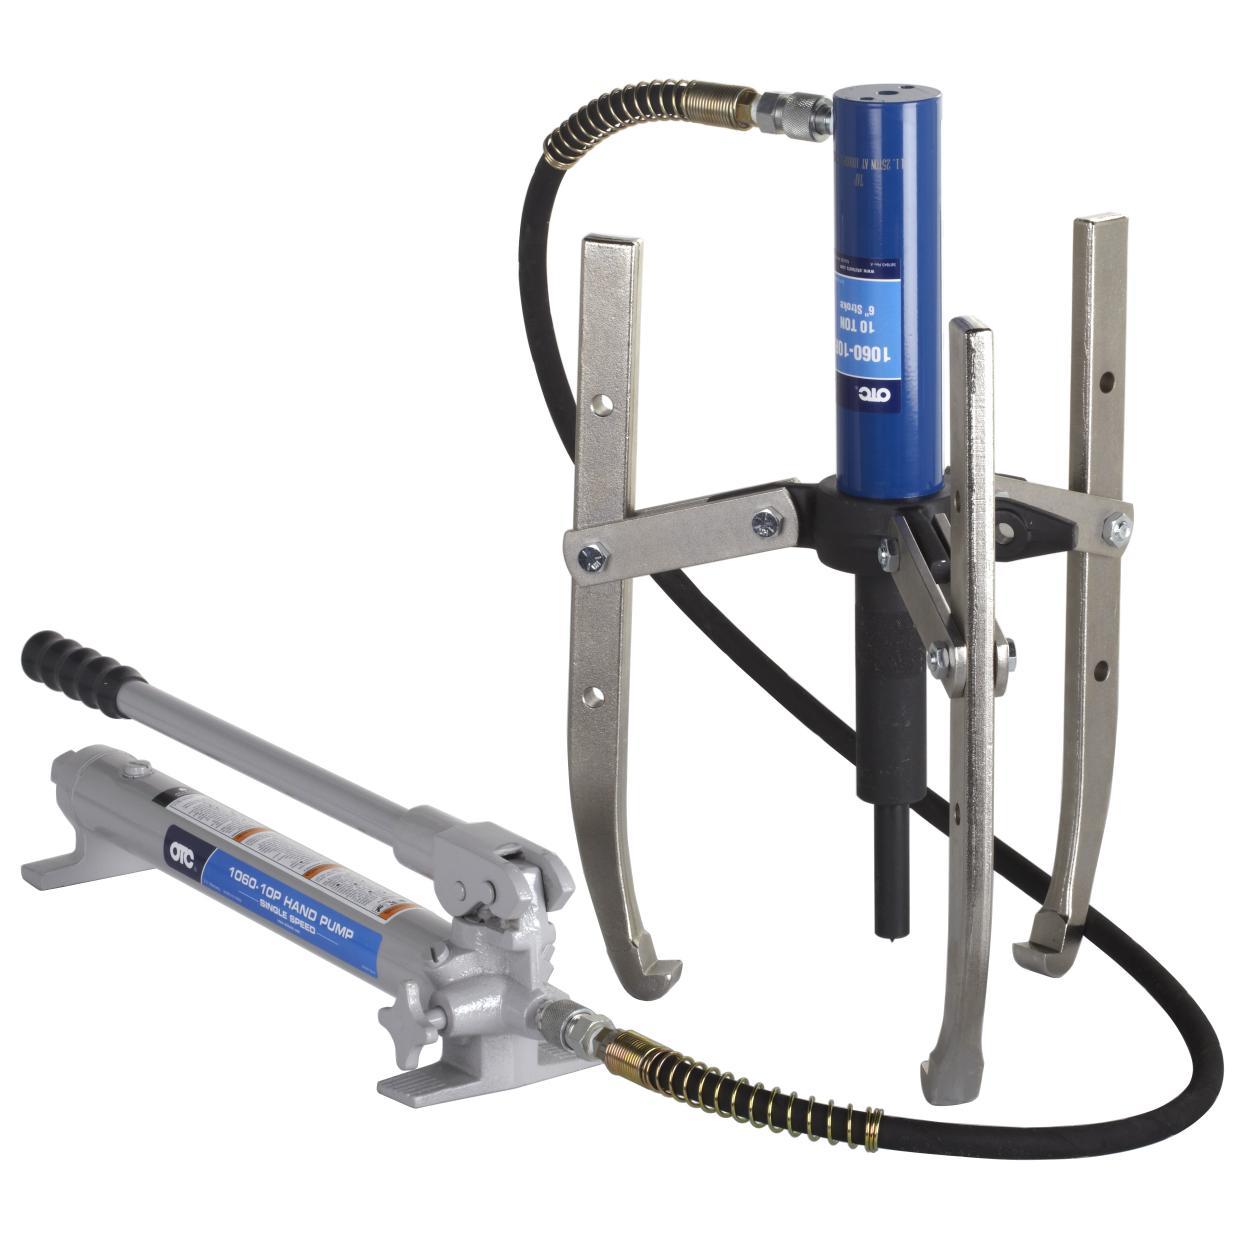 Abw Hydraulic Puller : Otc ton hydraulic puller kit tools